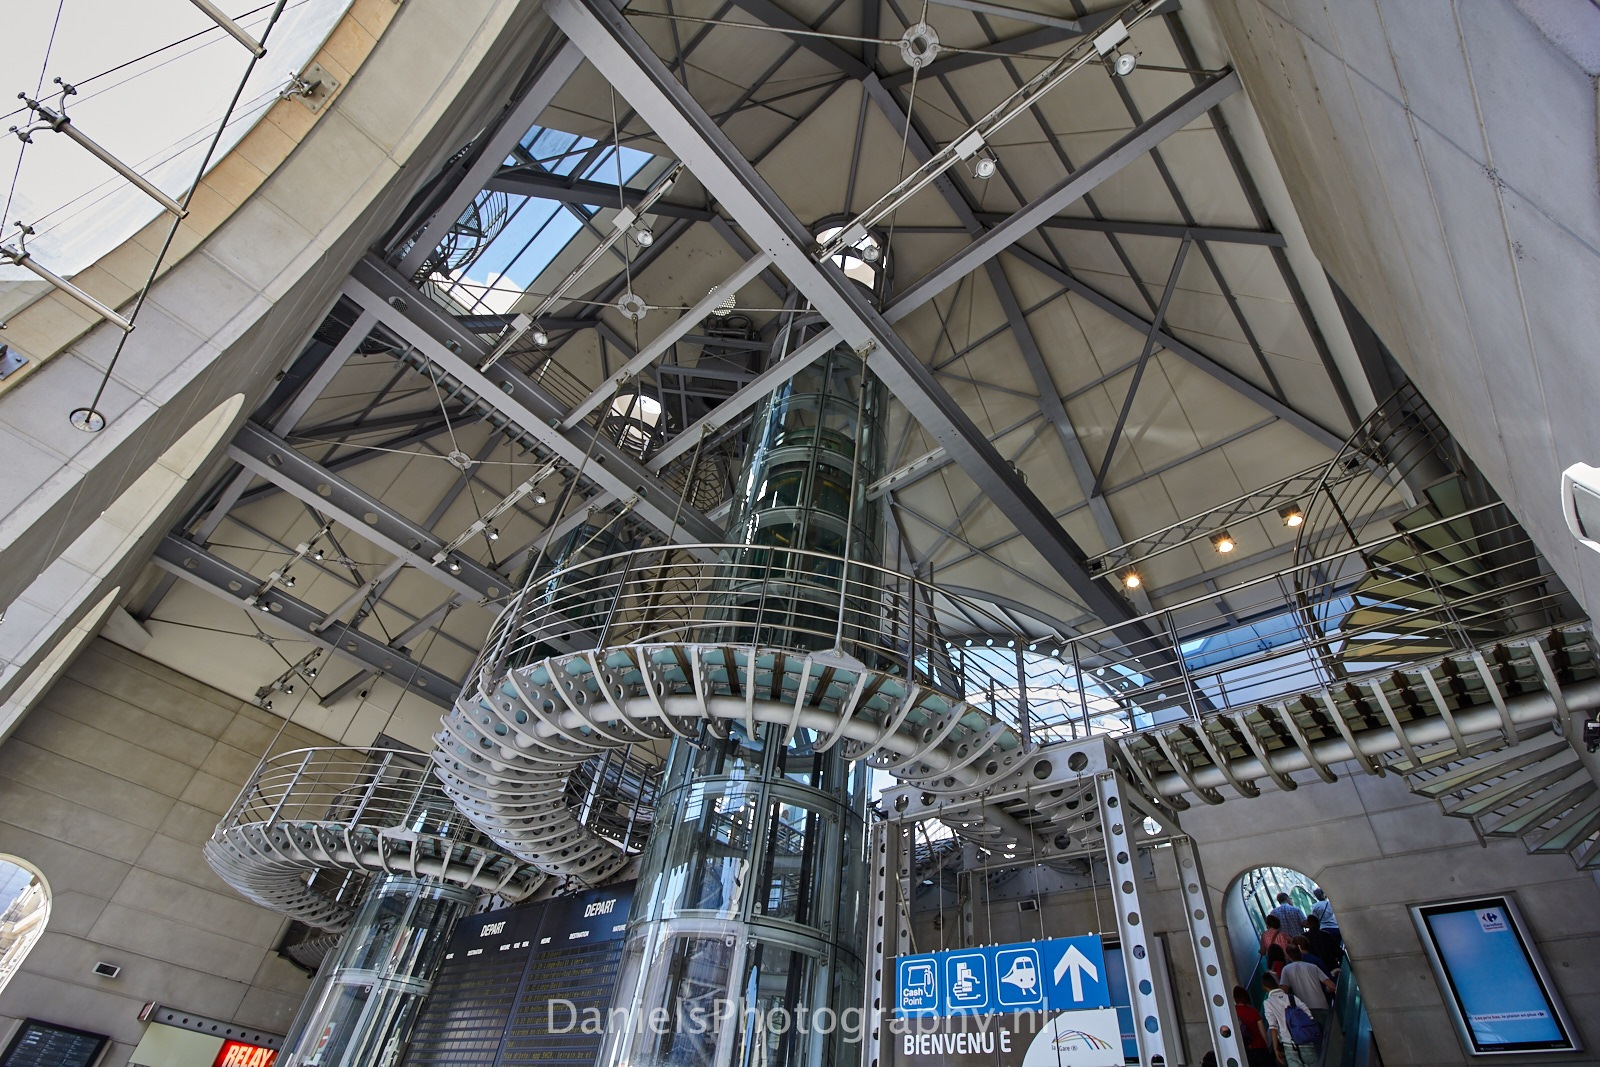 Gare de Namur - Namur Trainstation by Gerard Daniels